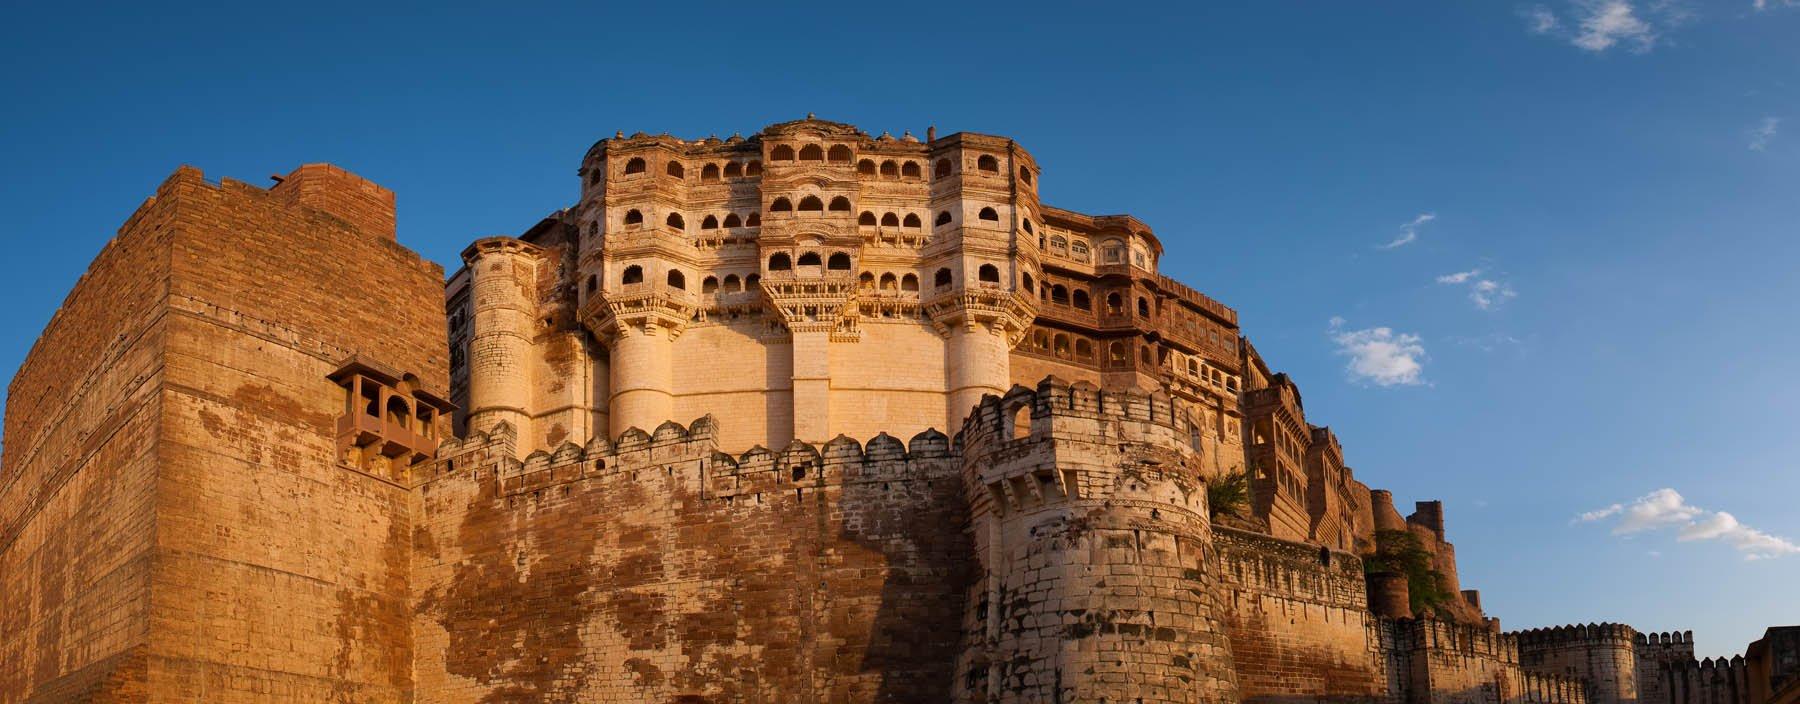 in, jodhpur, panoramic view of the mehrangarh fort.jpg